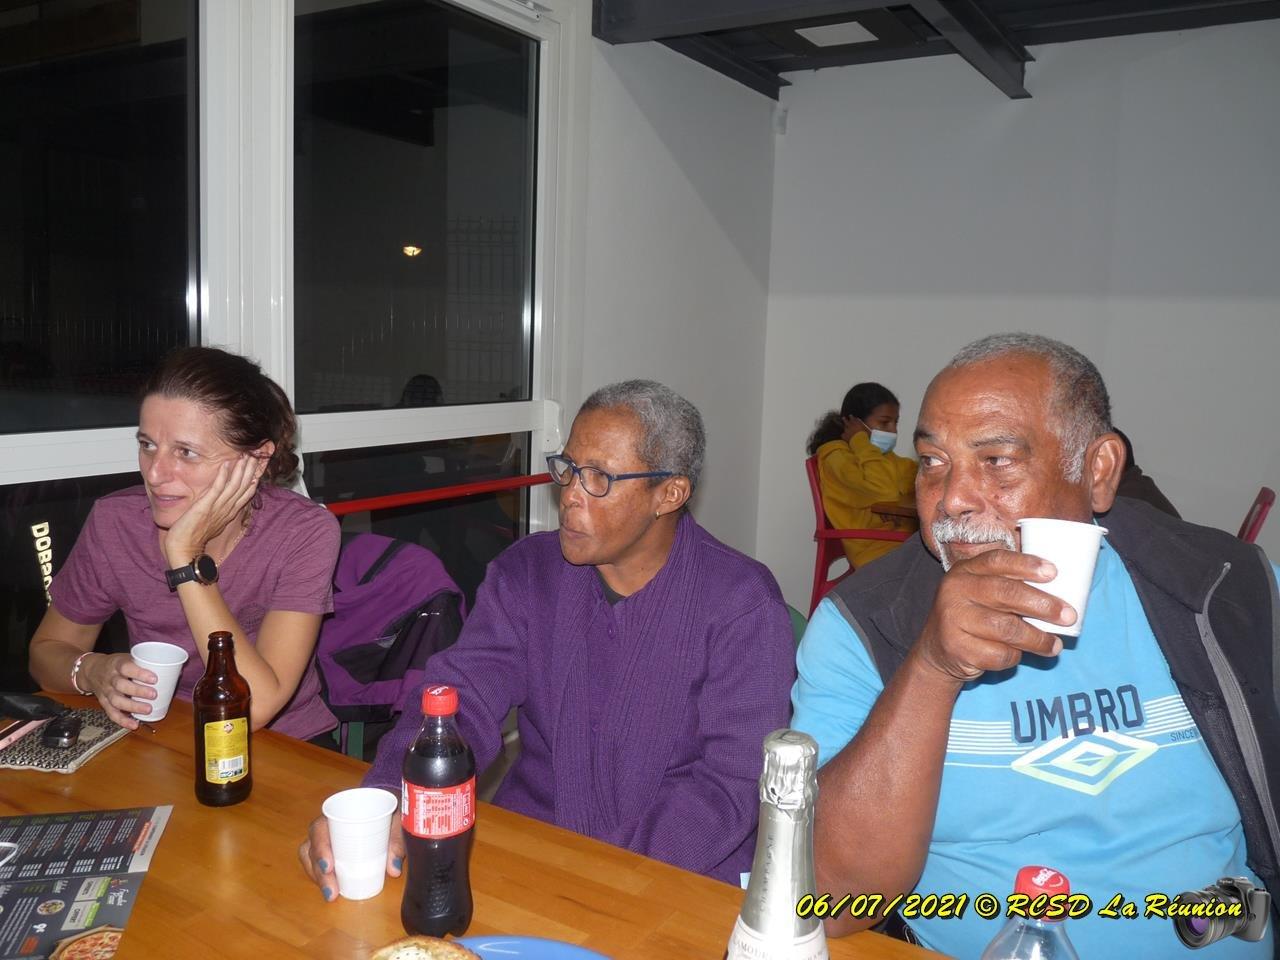 20210706 Entrain Trail Trinité 092